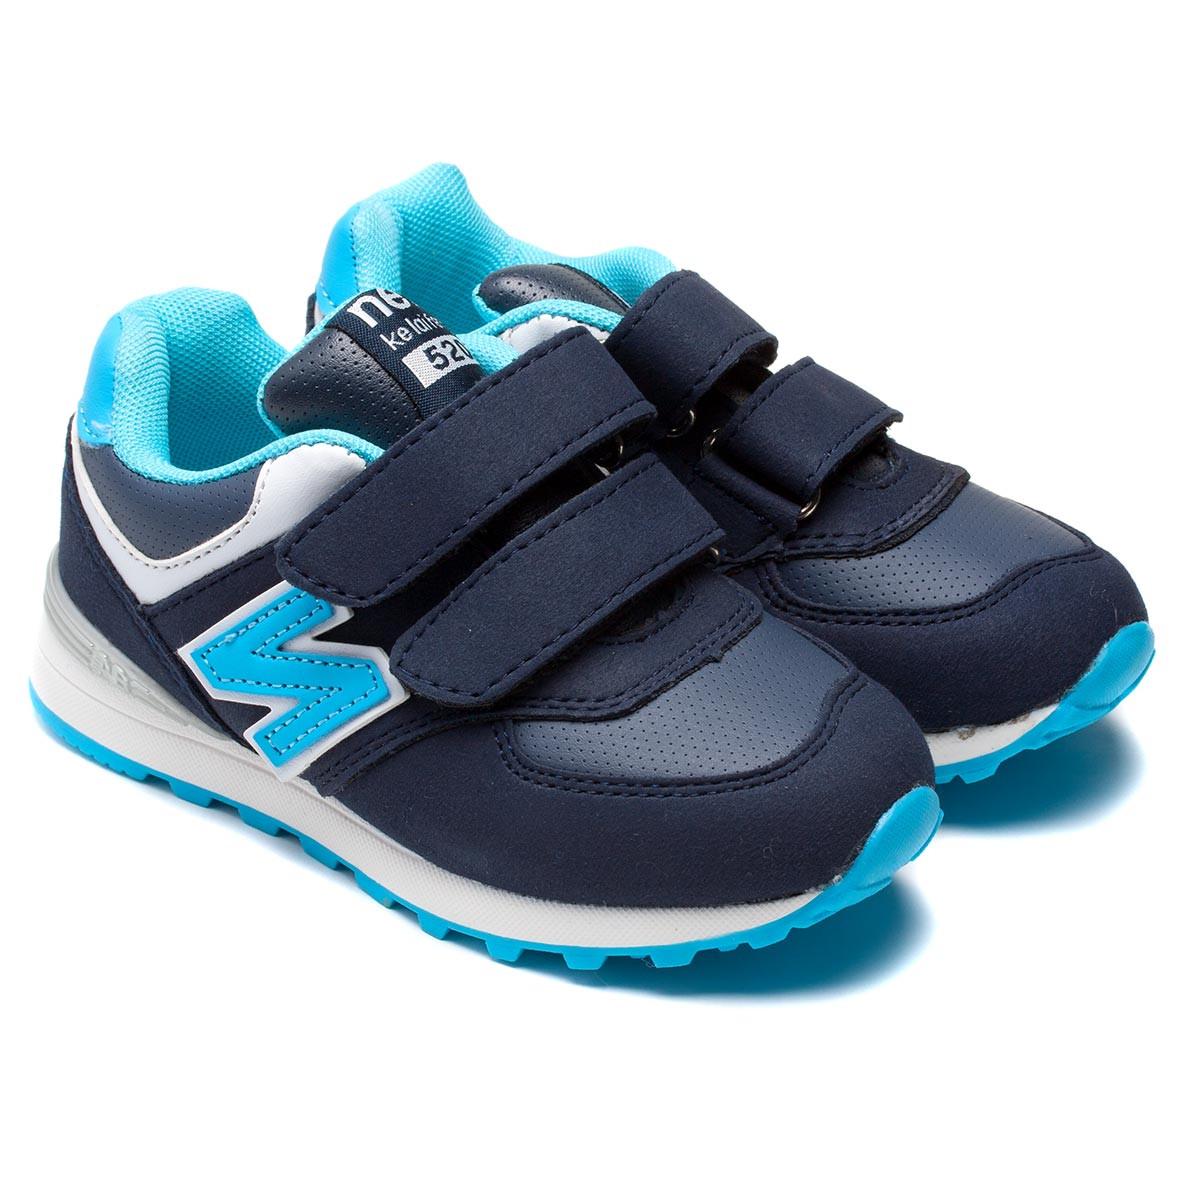 Детские кроссовки Солнце, синие, размер 26-31